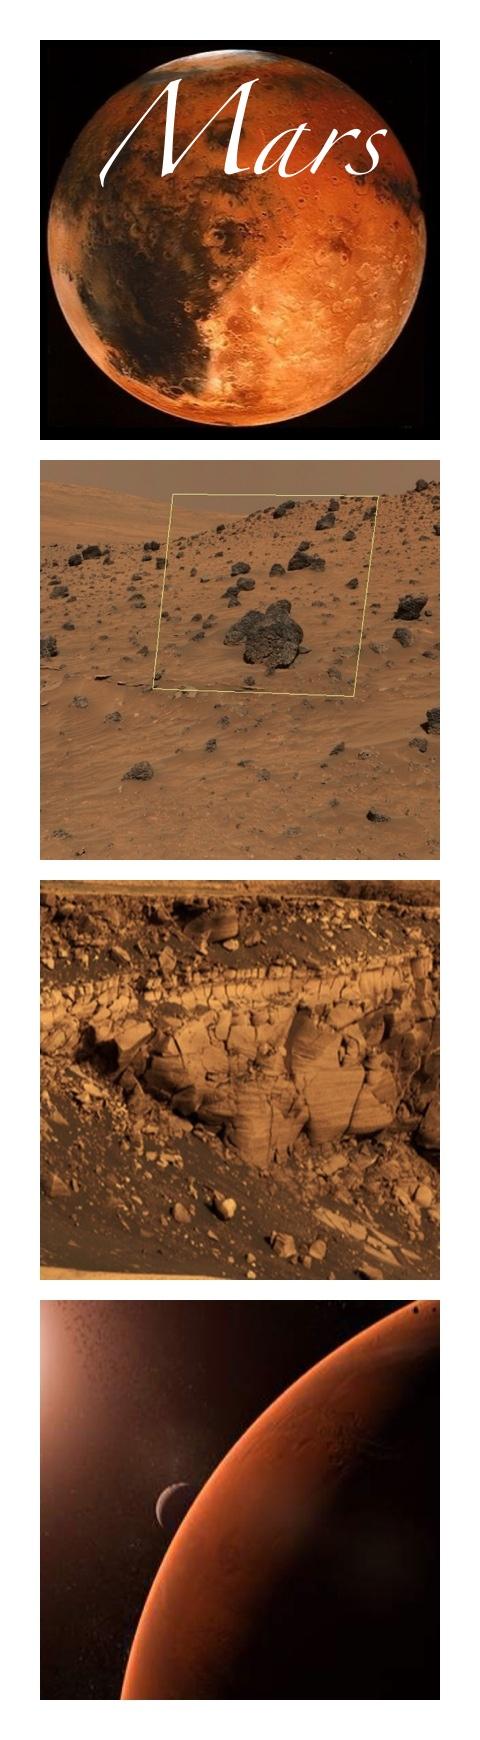 Mars Planet Radius 2 106 Miles 3 390 Km People Also Search For Jupiter Venus Earth Mercury Saturn Moons Phobos Deimos Mars Planet Planets Jupiter